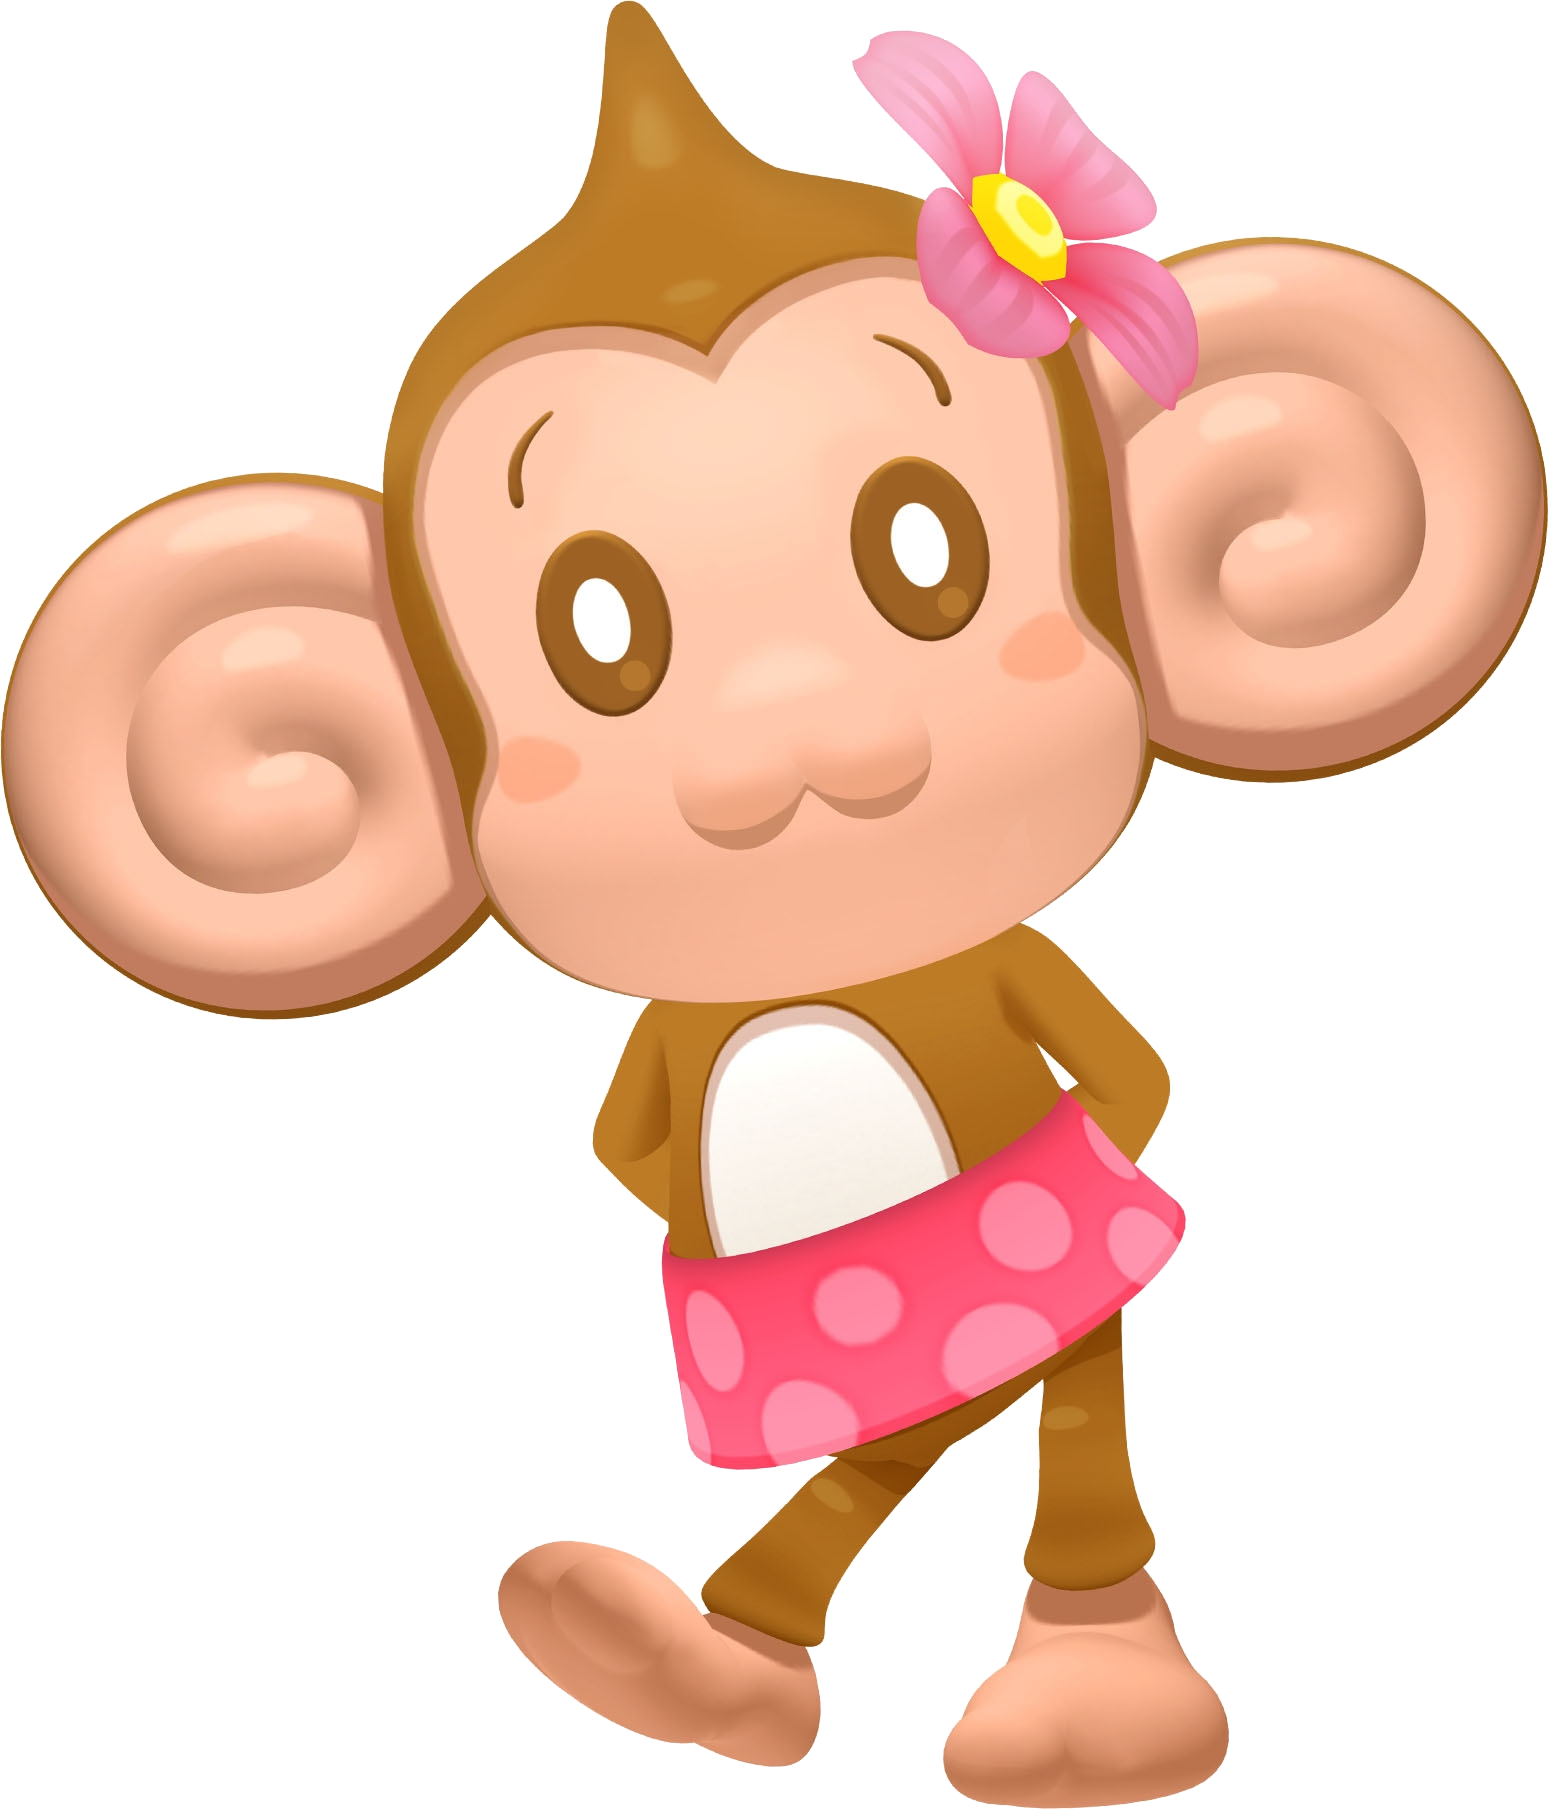 Monkeys clipart doctor. Meemee super monkey ball